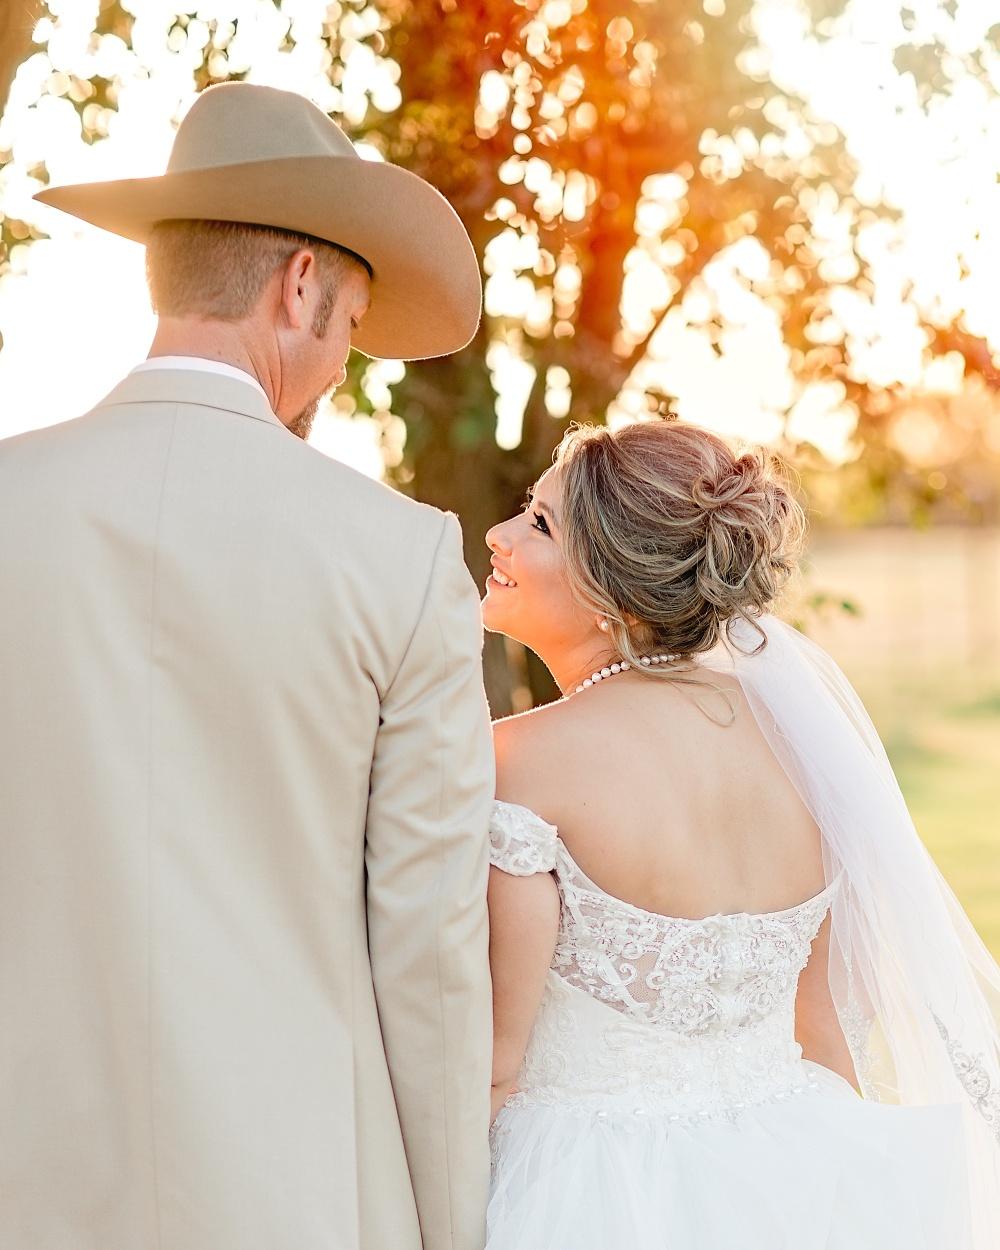 Wedding-Photographer-Rustic-Sunflower-theme-Texas-Carly-Barton-Photography_0120.jpg